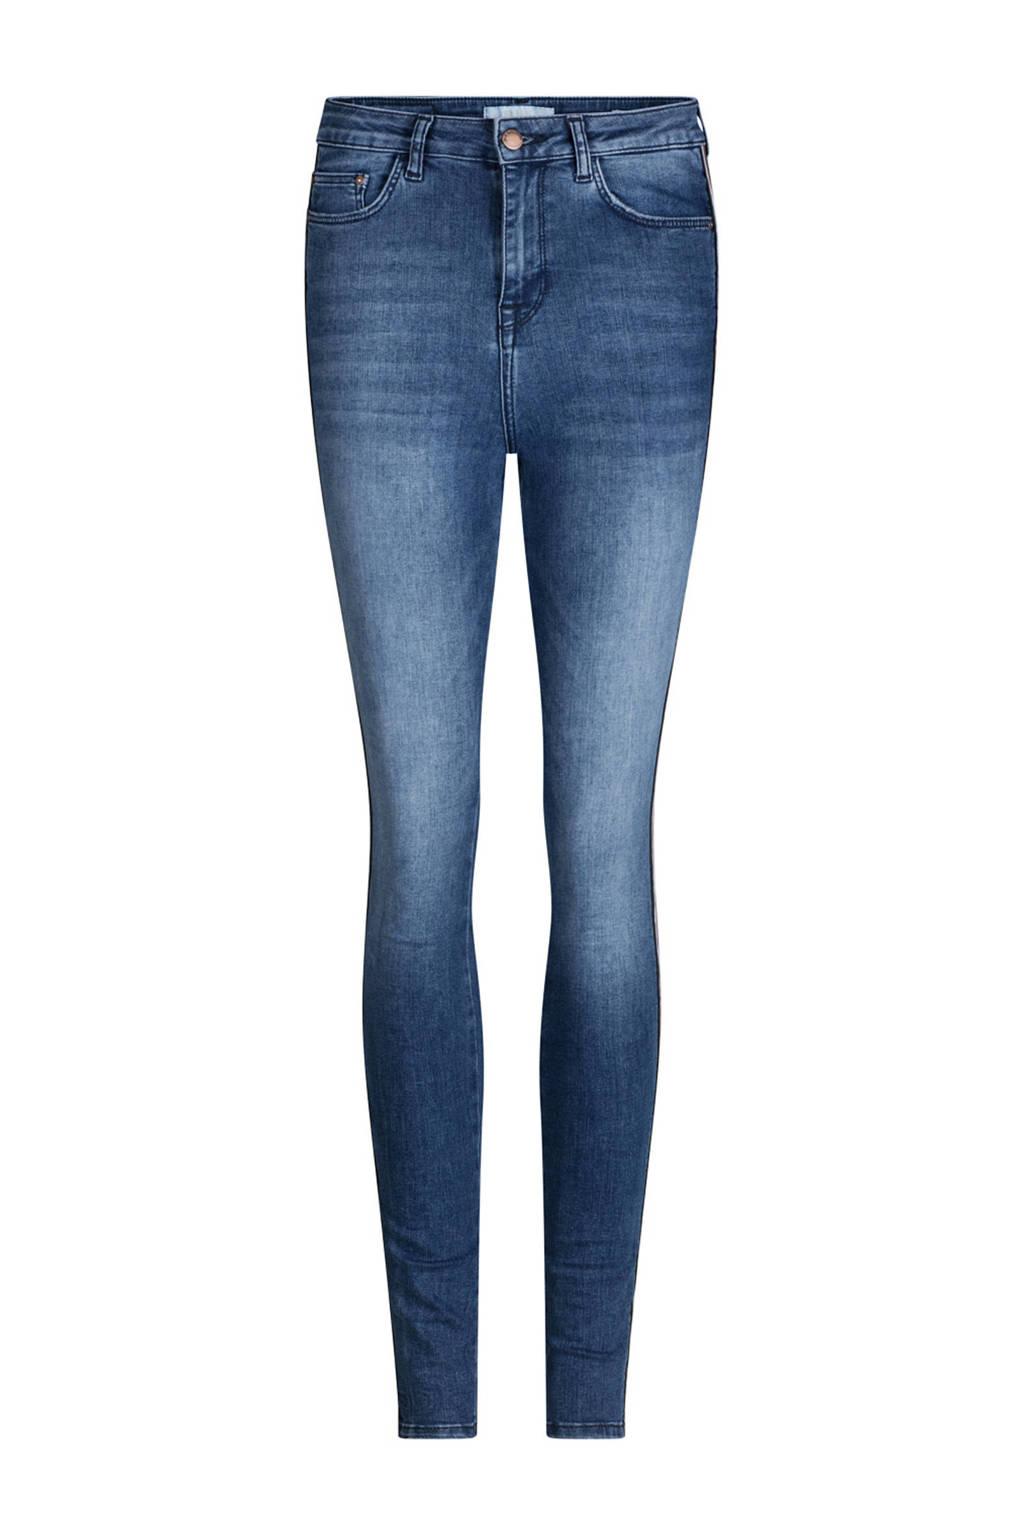 WE Fashion Blue Ridge high waist skinny jeans met zijstreep, Stonewashed